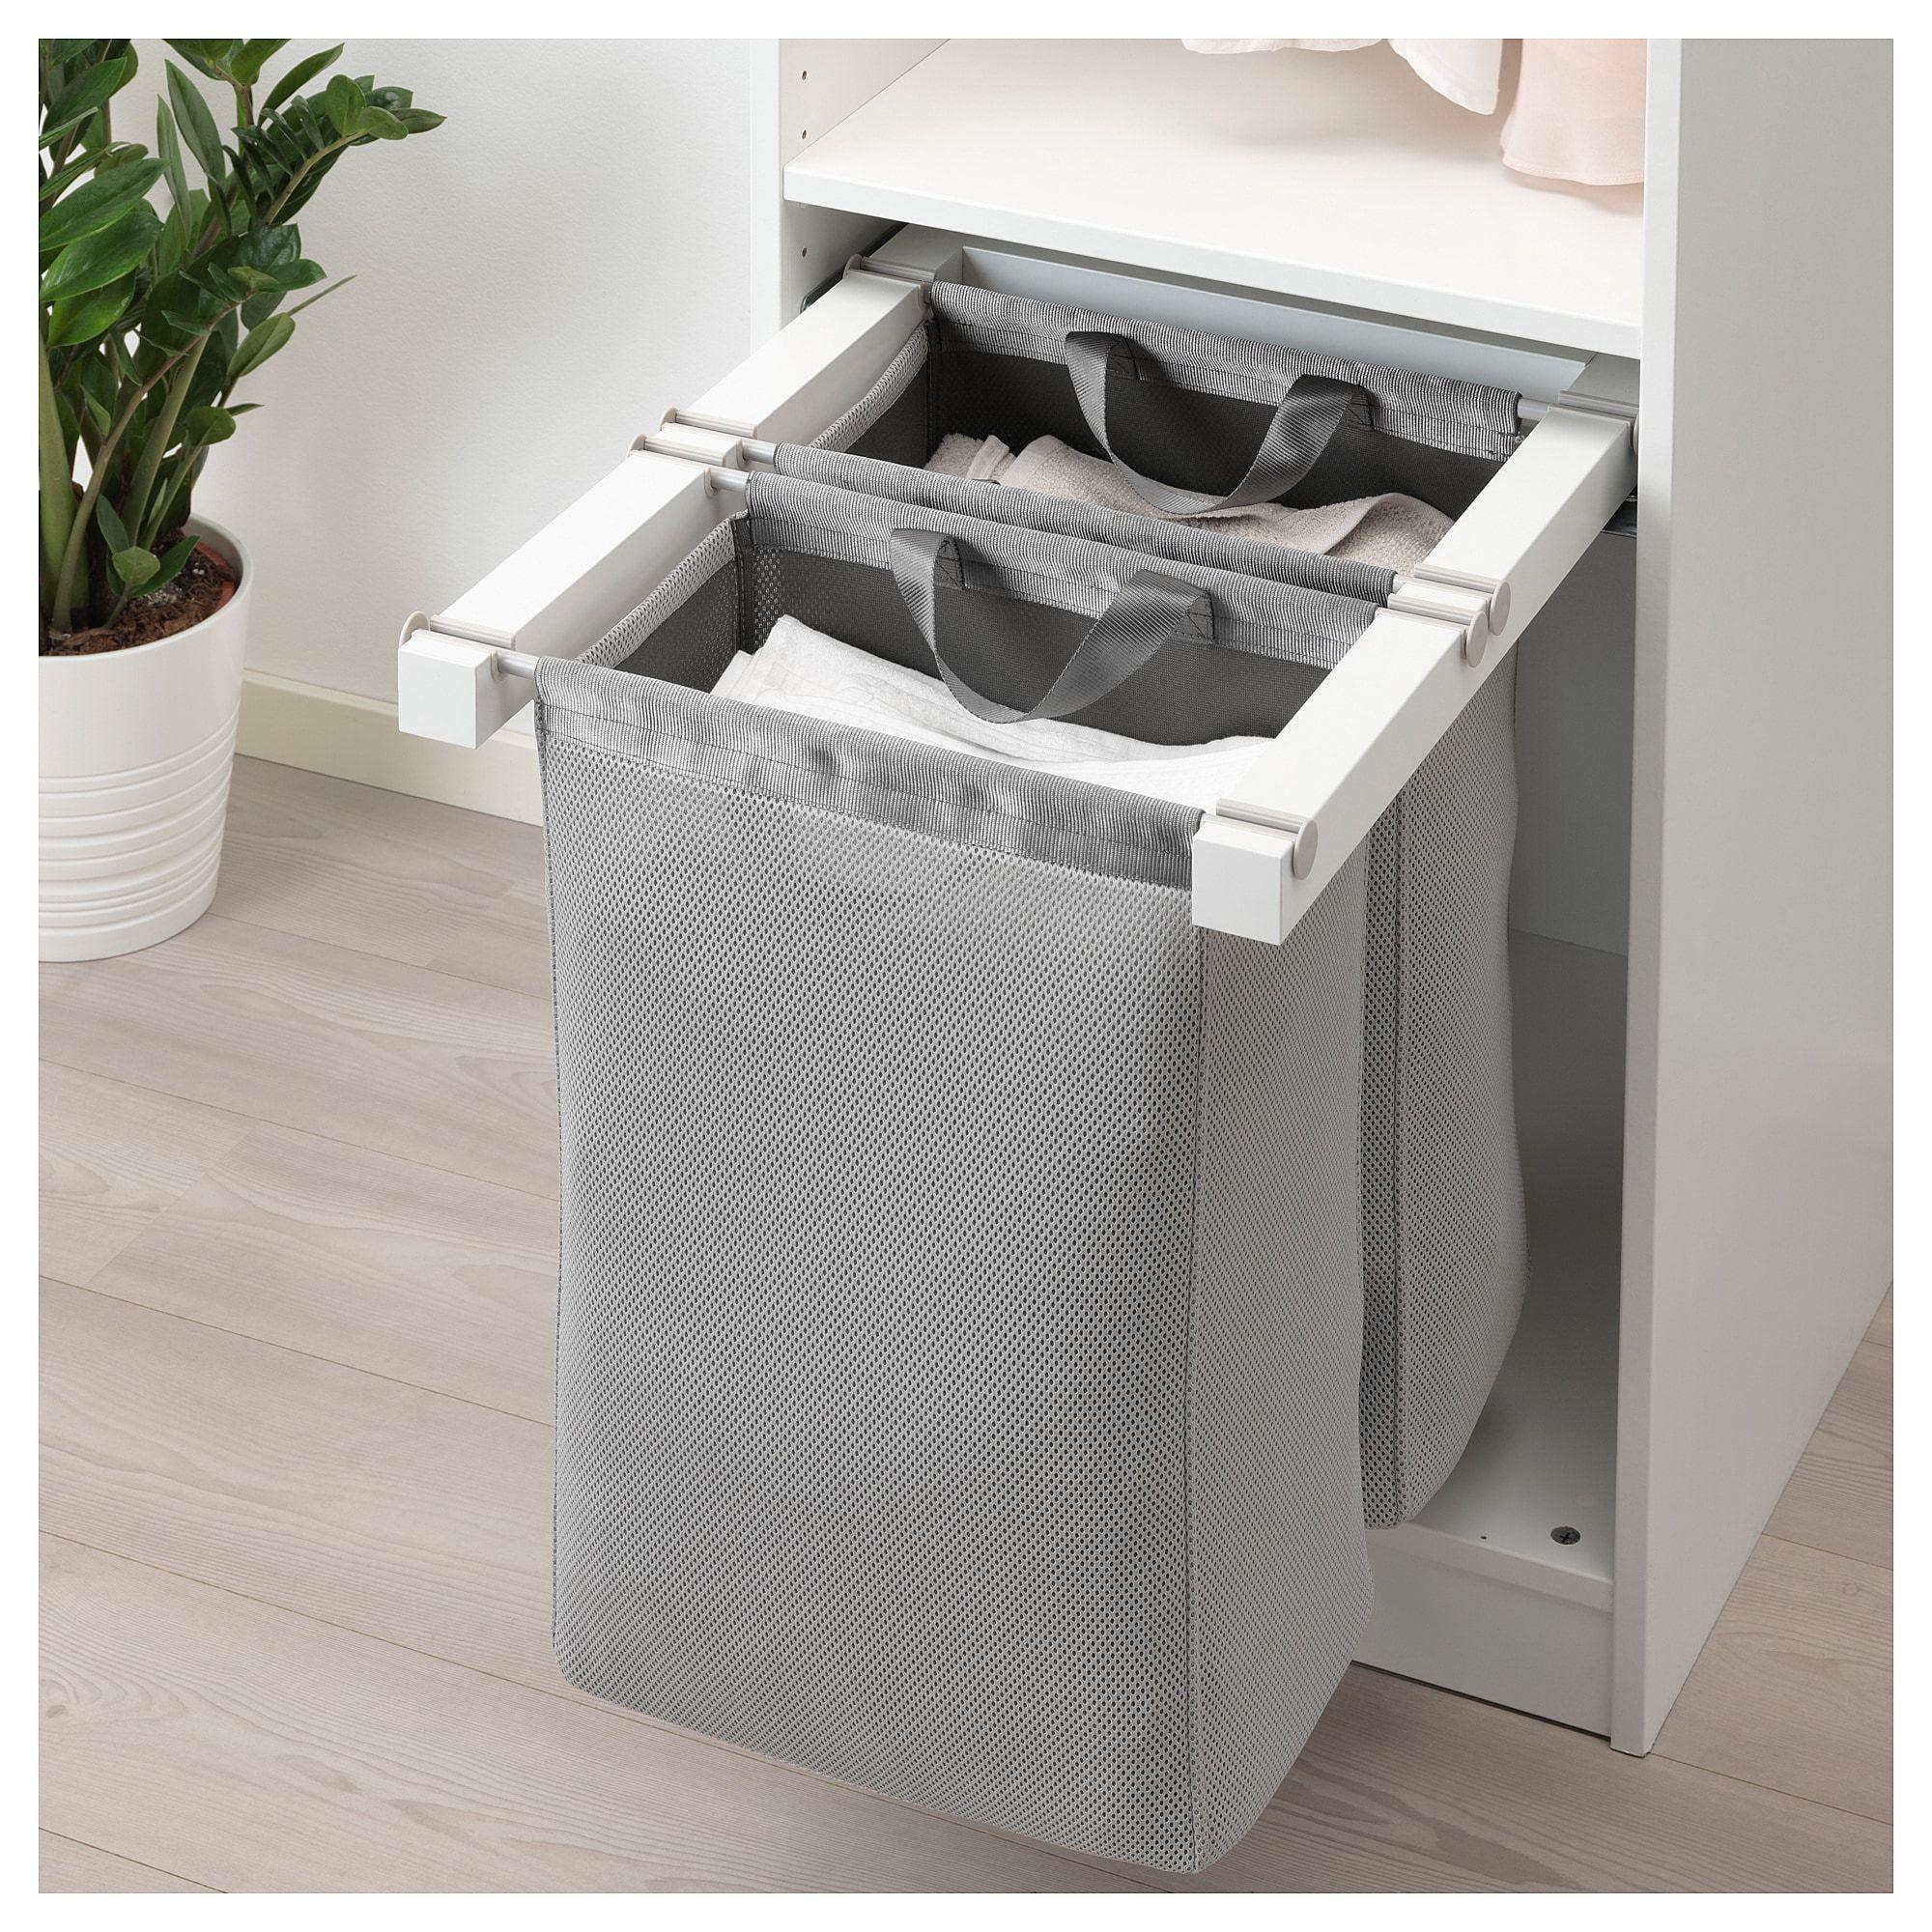 Komplement Beutel Ausziehbar Weiß Ikea Laundry Room Storage Ikea Komplement Laundry Room Organization